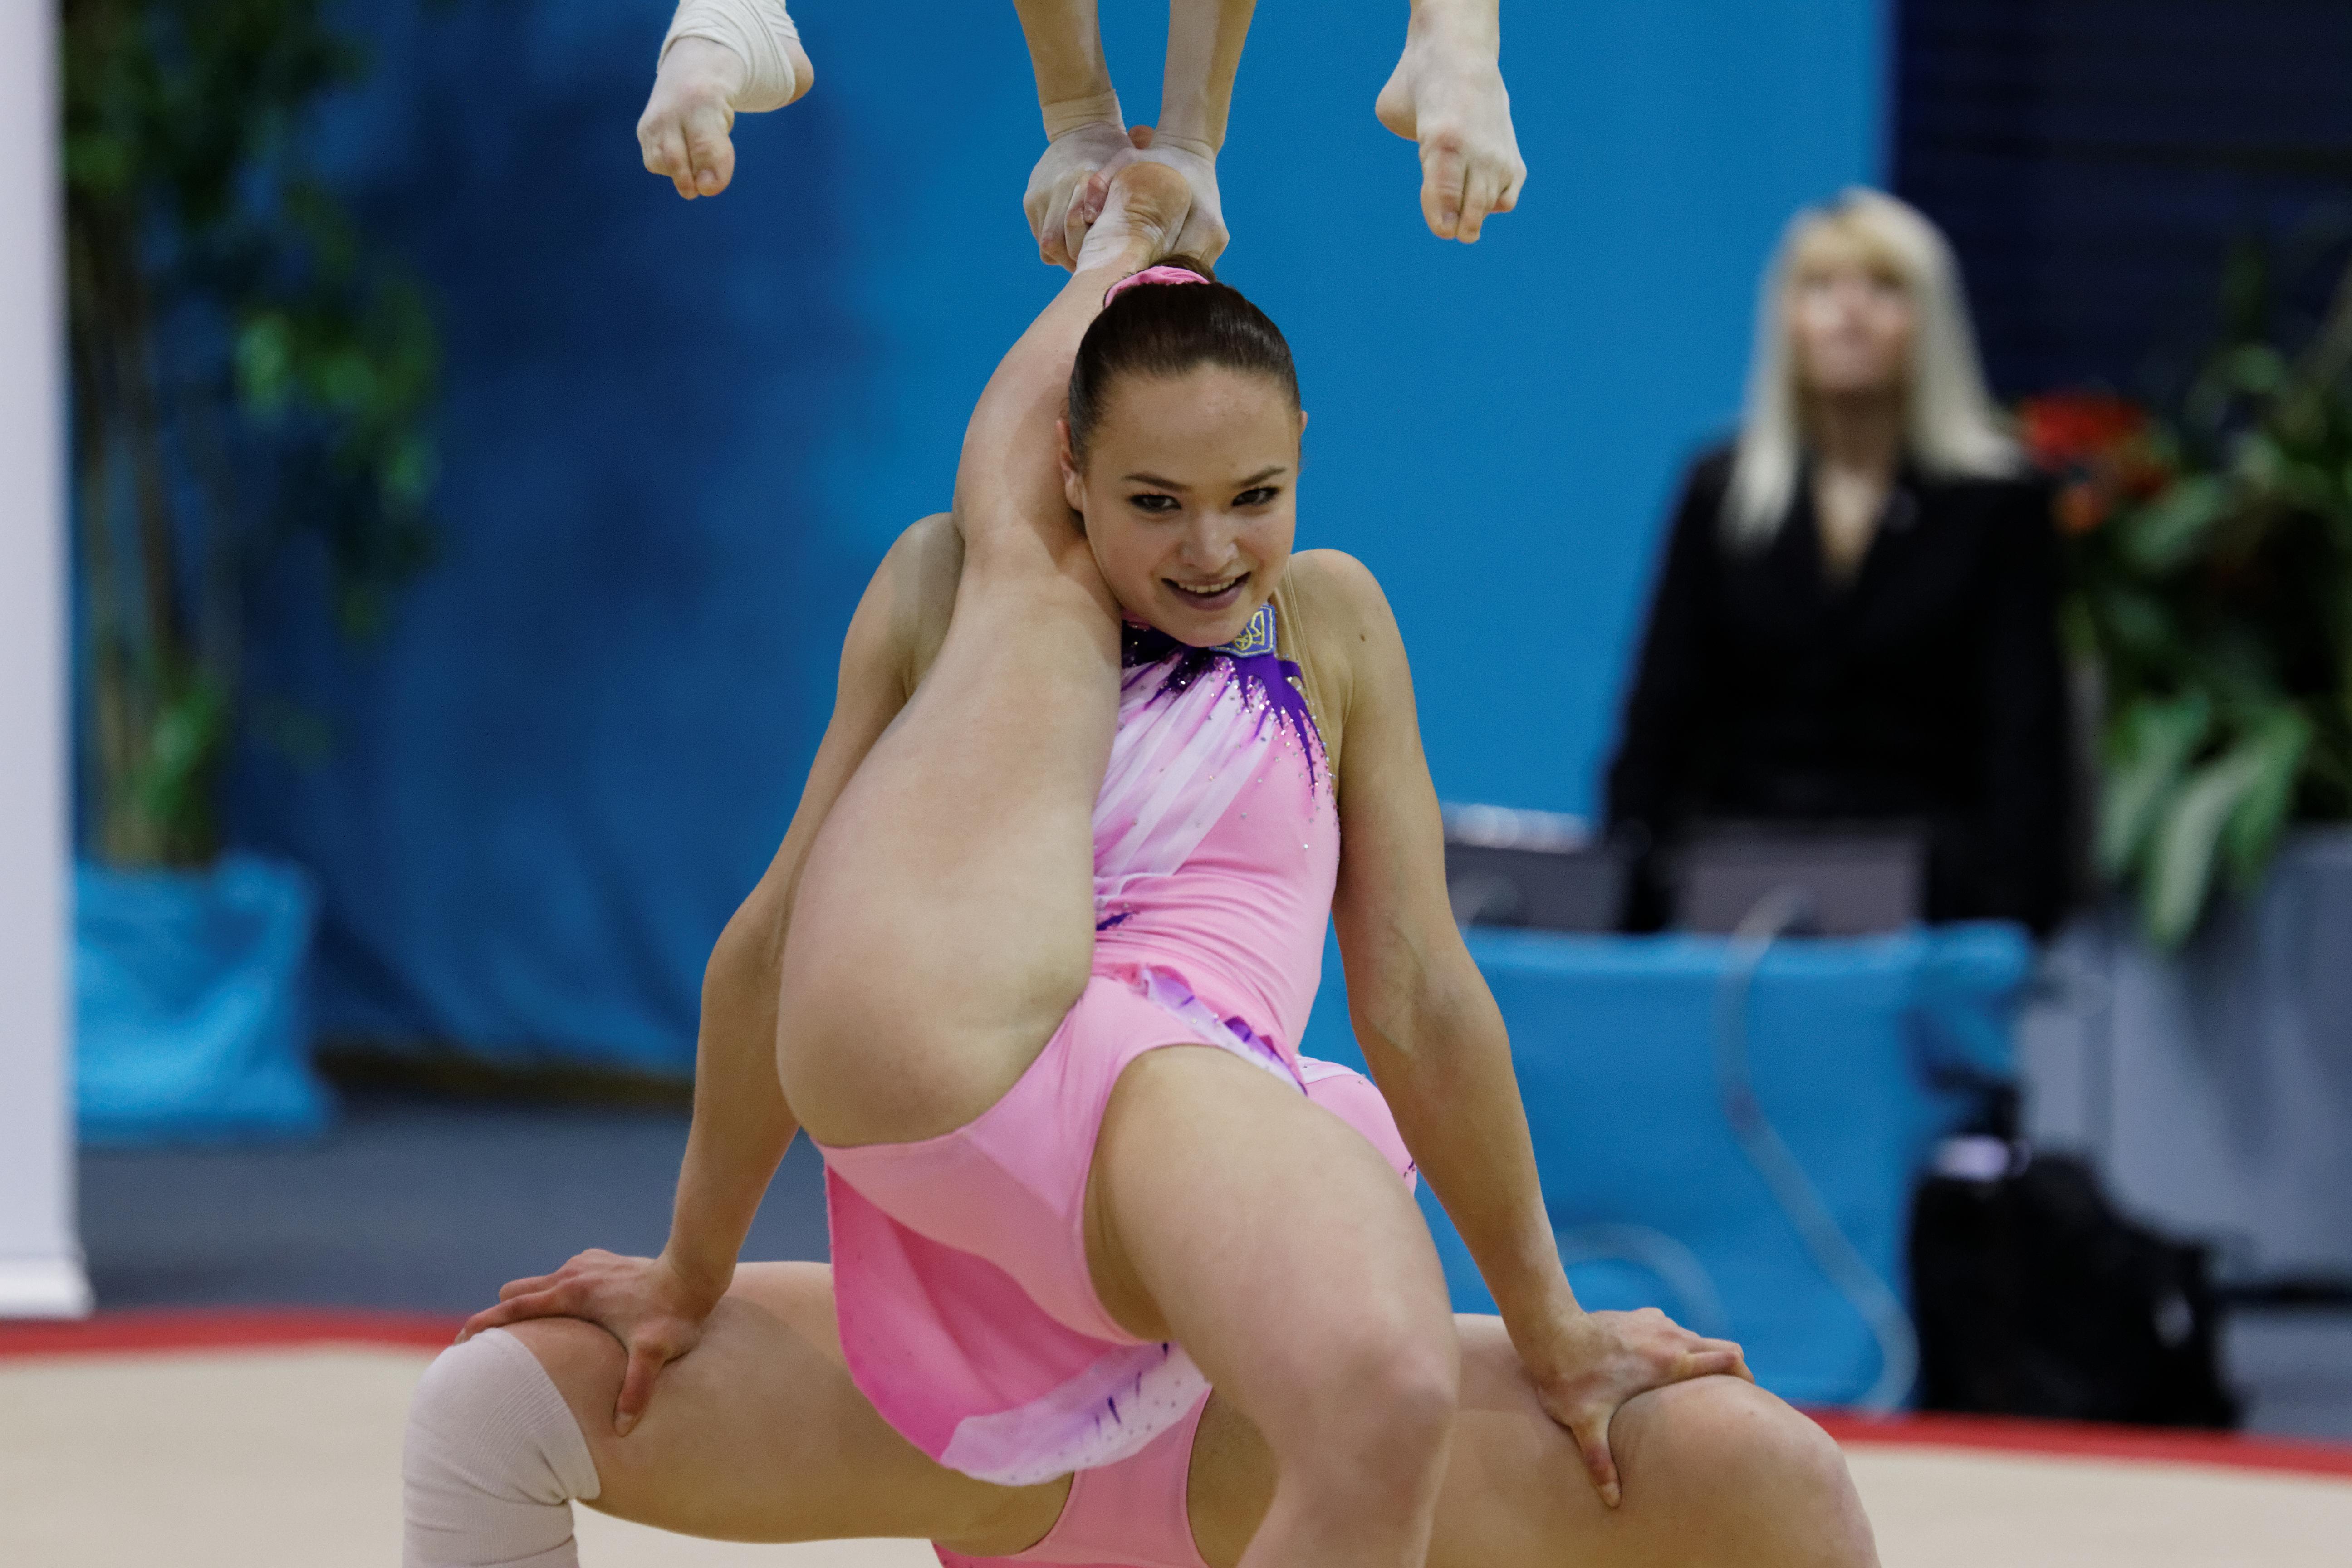 Фото между ног у гимнасток, гигантские порно видео